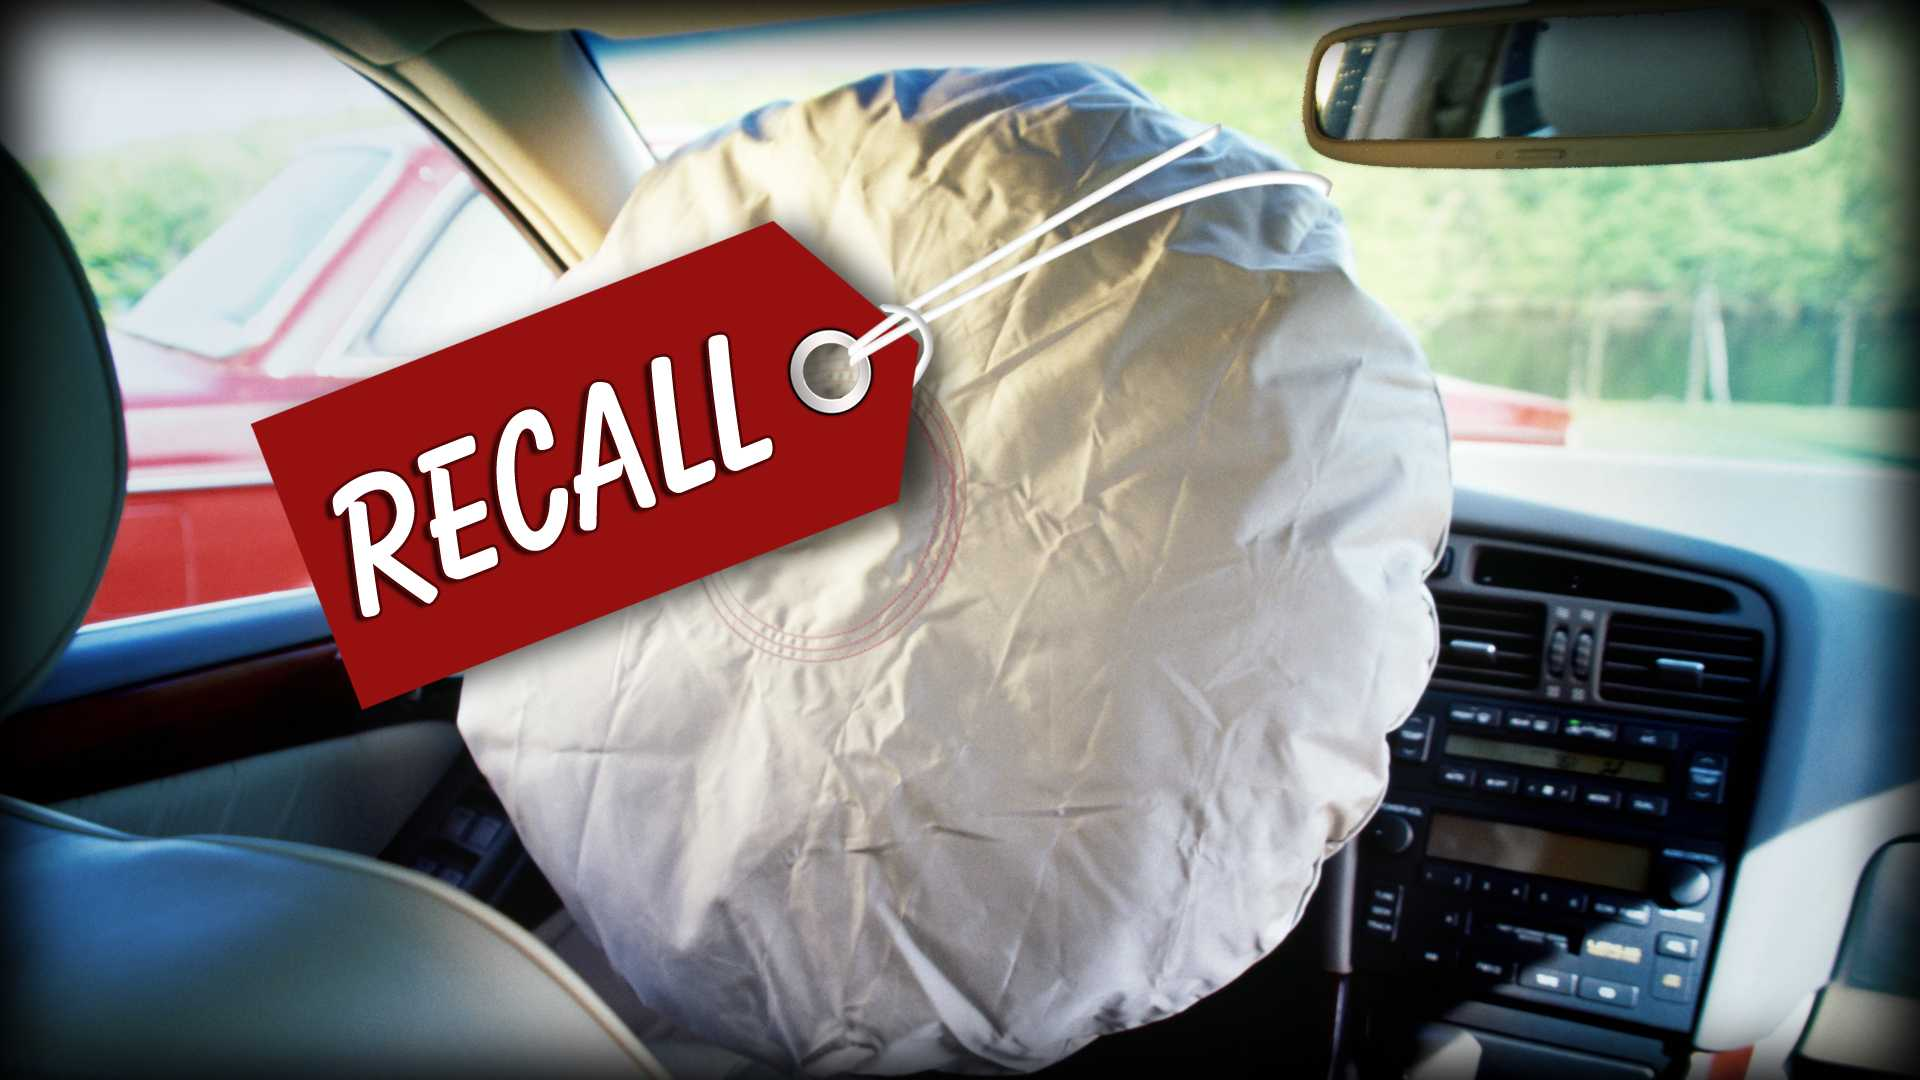 takata air bag issue plagues 2016 honda cr v and nissan cars. Black Bedroom Furniture Sets. Home Design Ideas